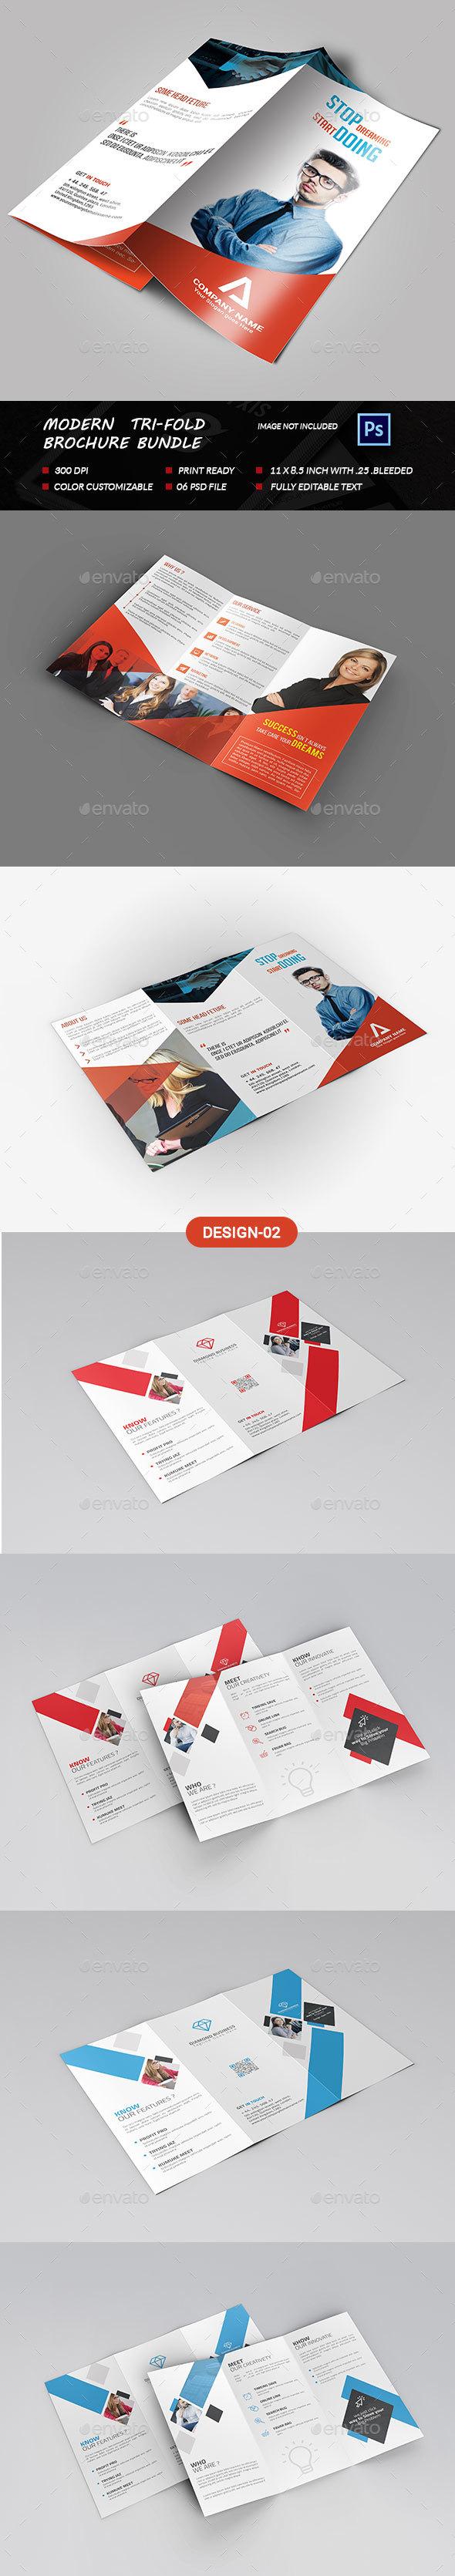 Modern Tri-fold Brochure Bundle  - Brochures Print Templates